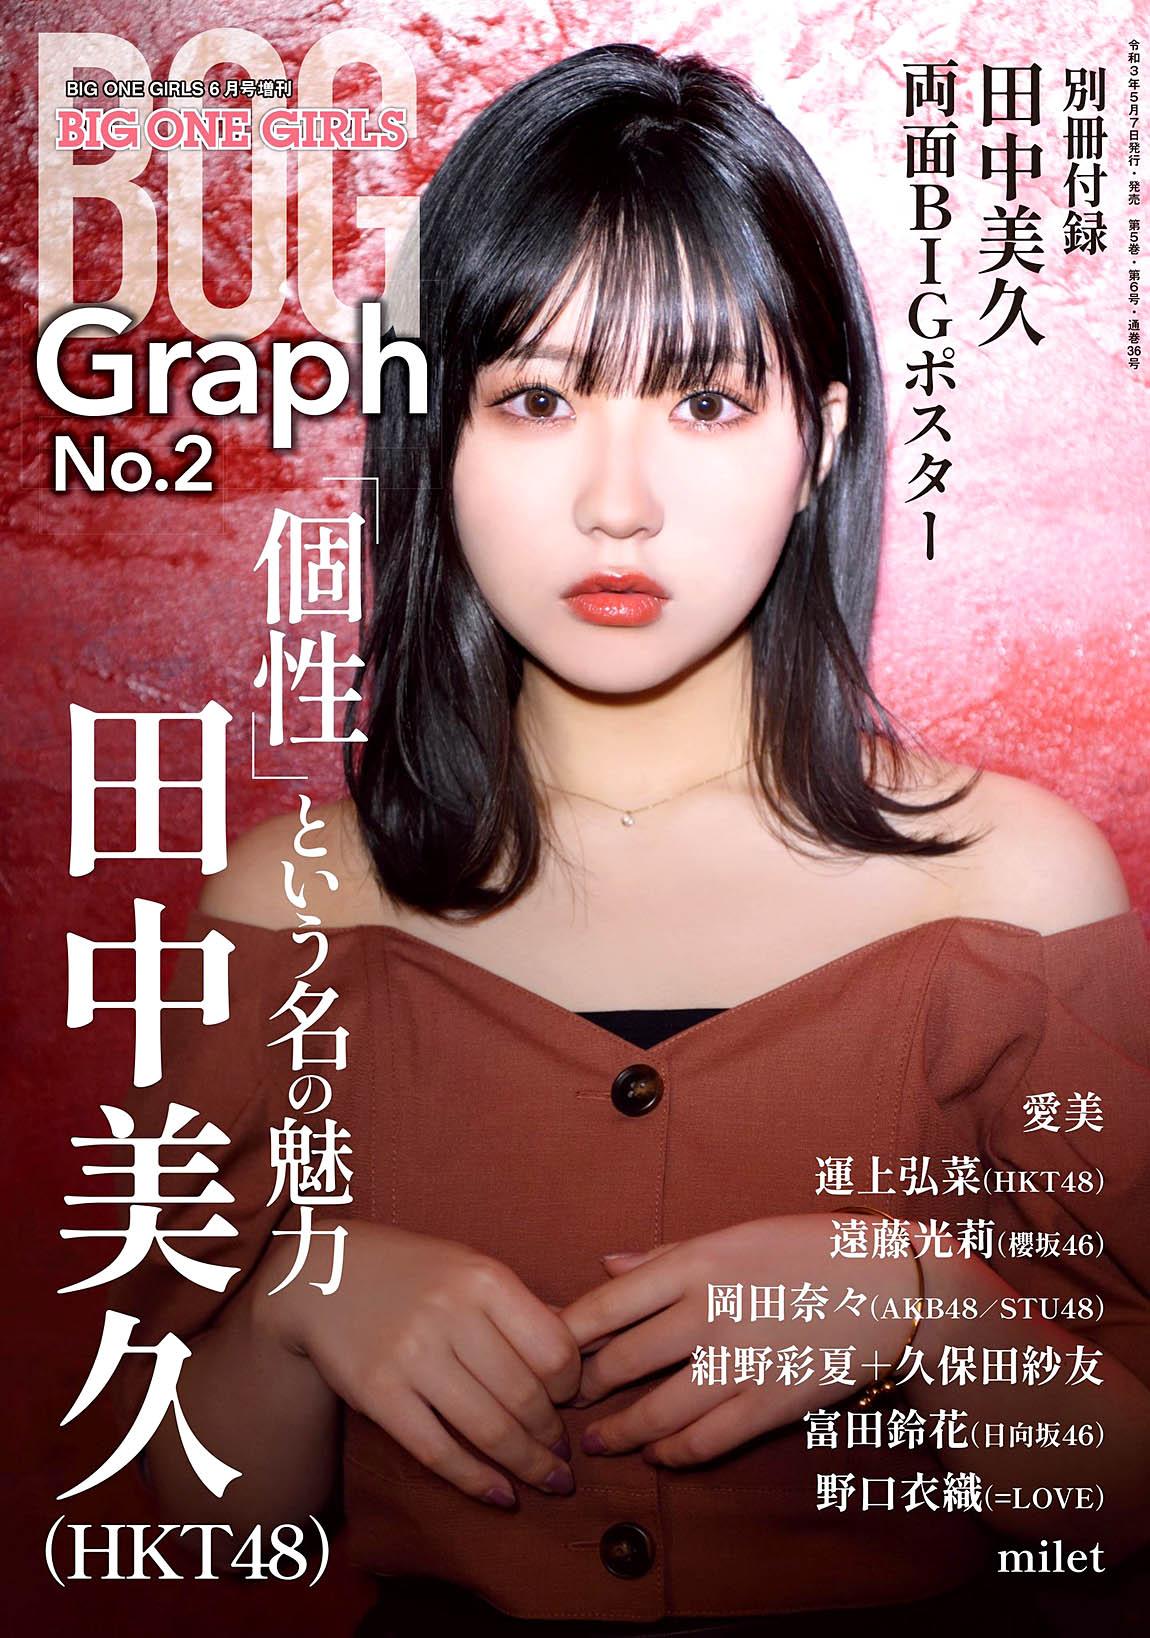 Tanaka Miku HKT48 BOG Graph Vol 2.jpg